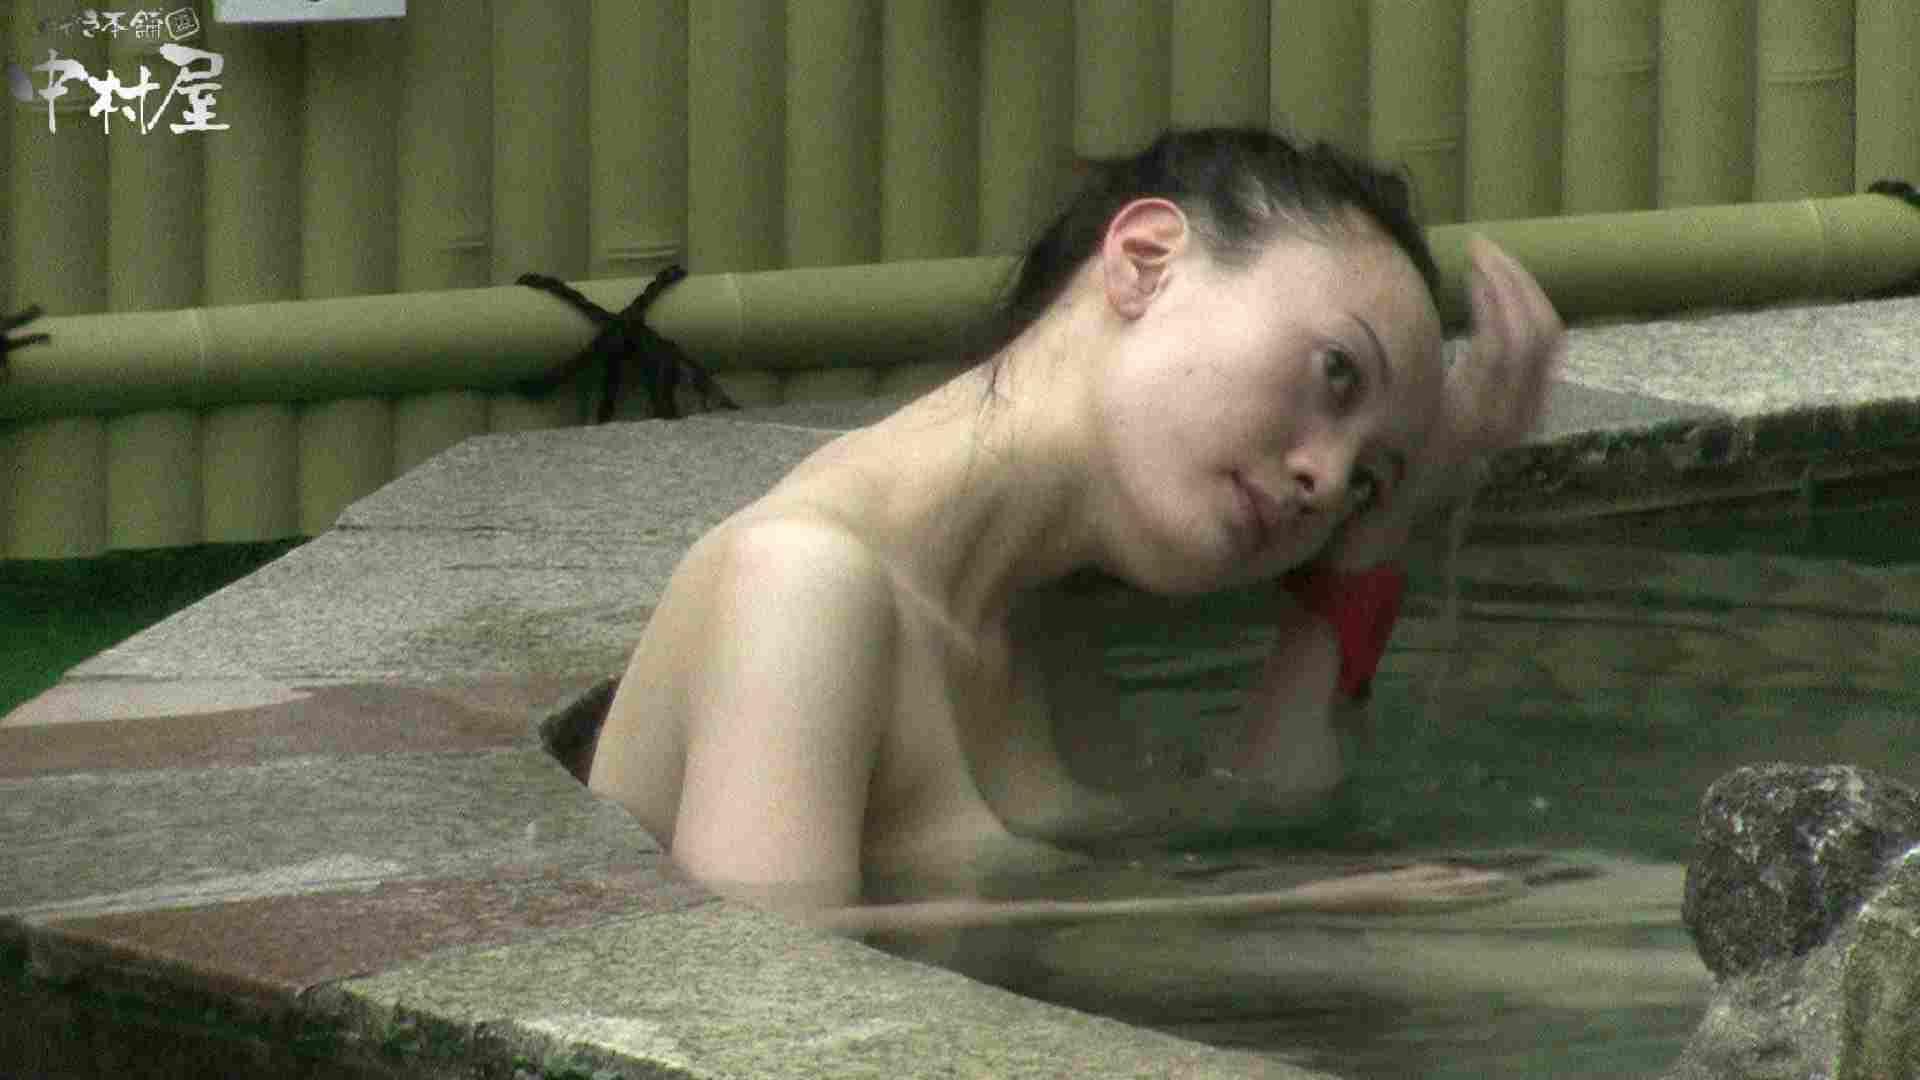 Aquaな露天風呂Vol.900 盗撮シリーズ | 露天風呂編  110PIX 21